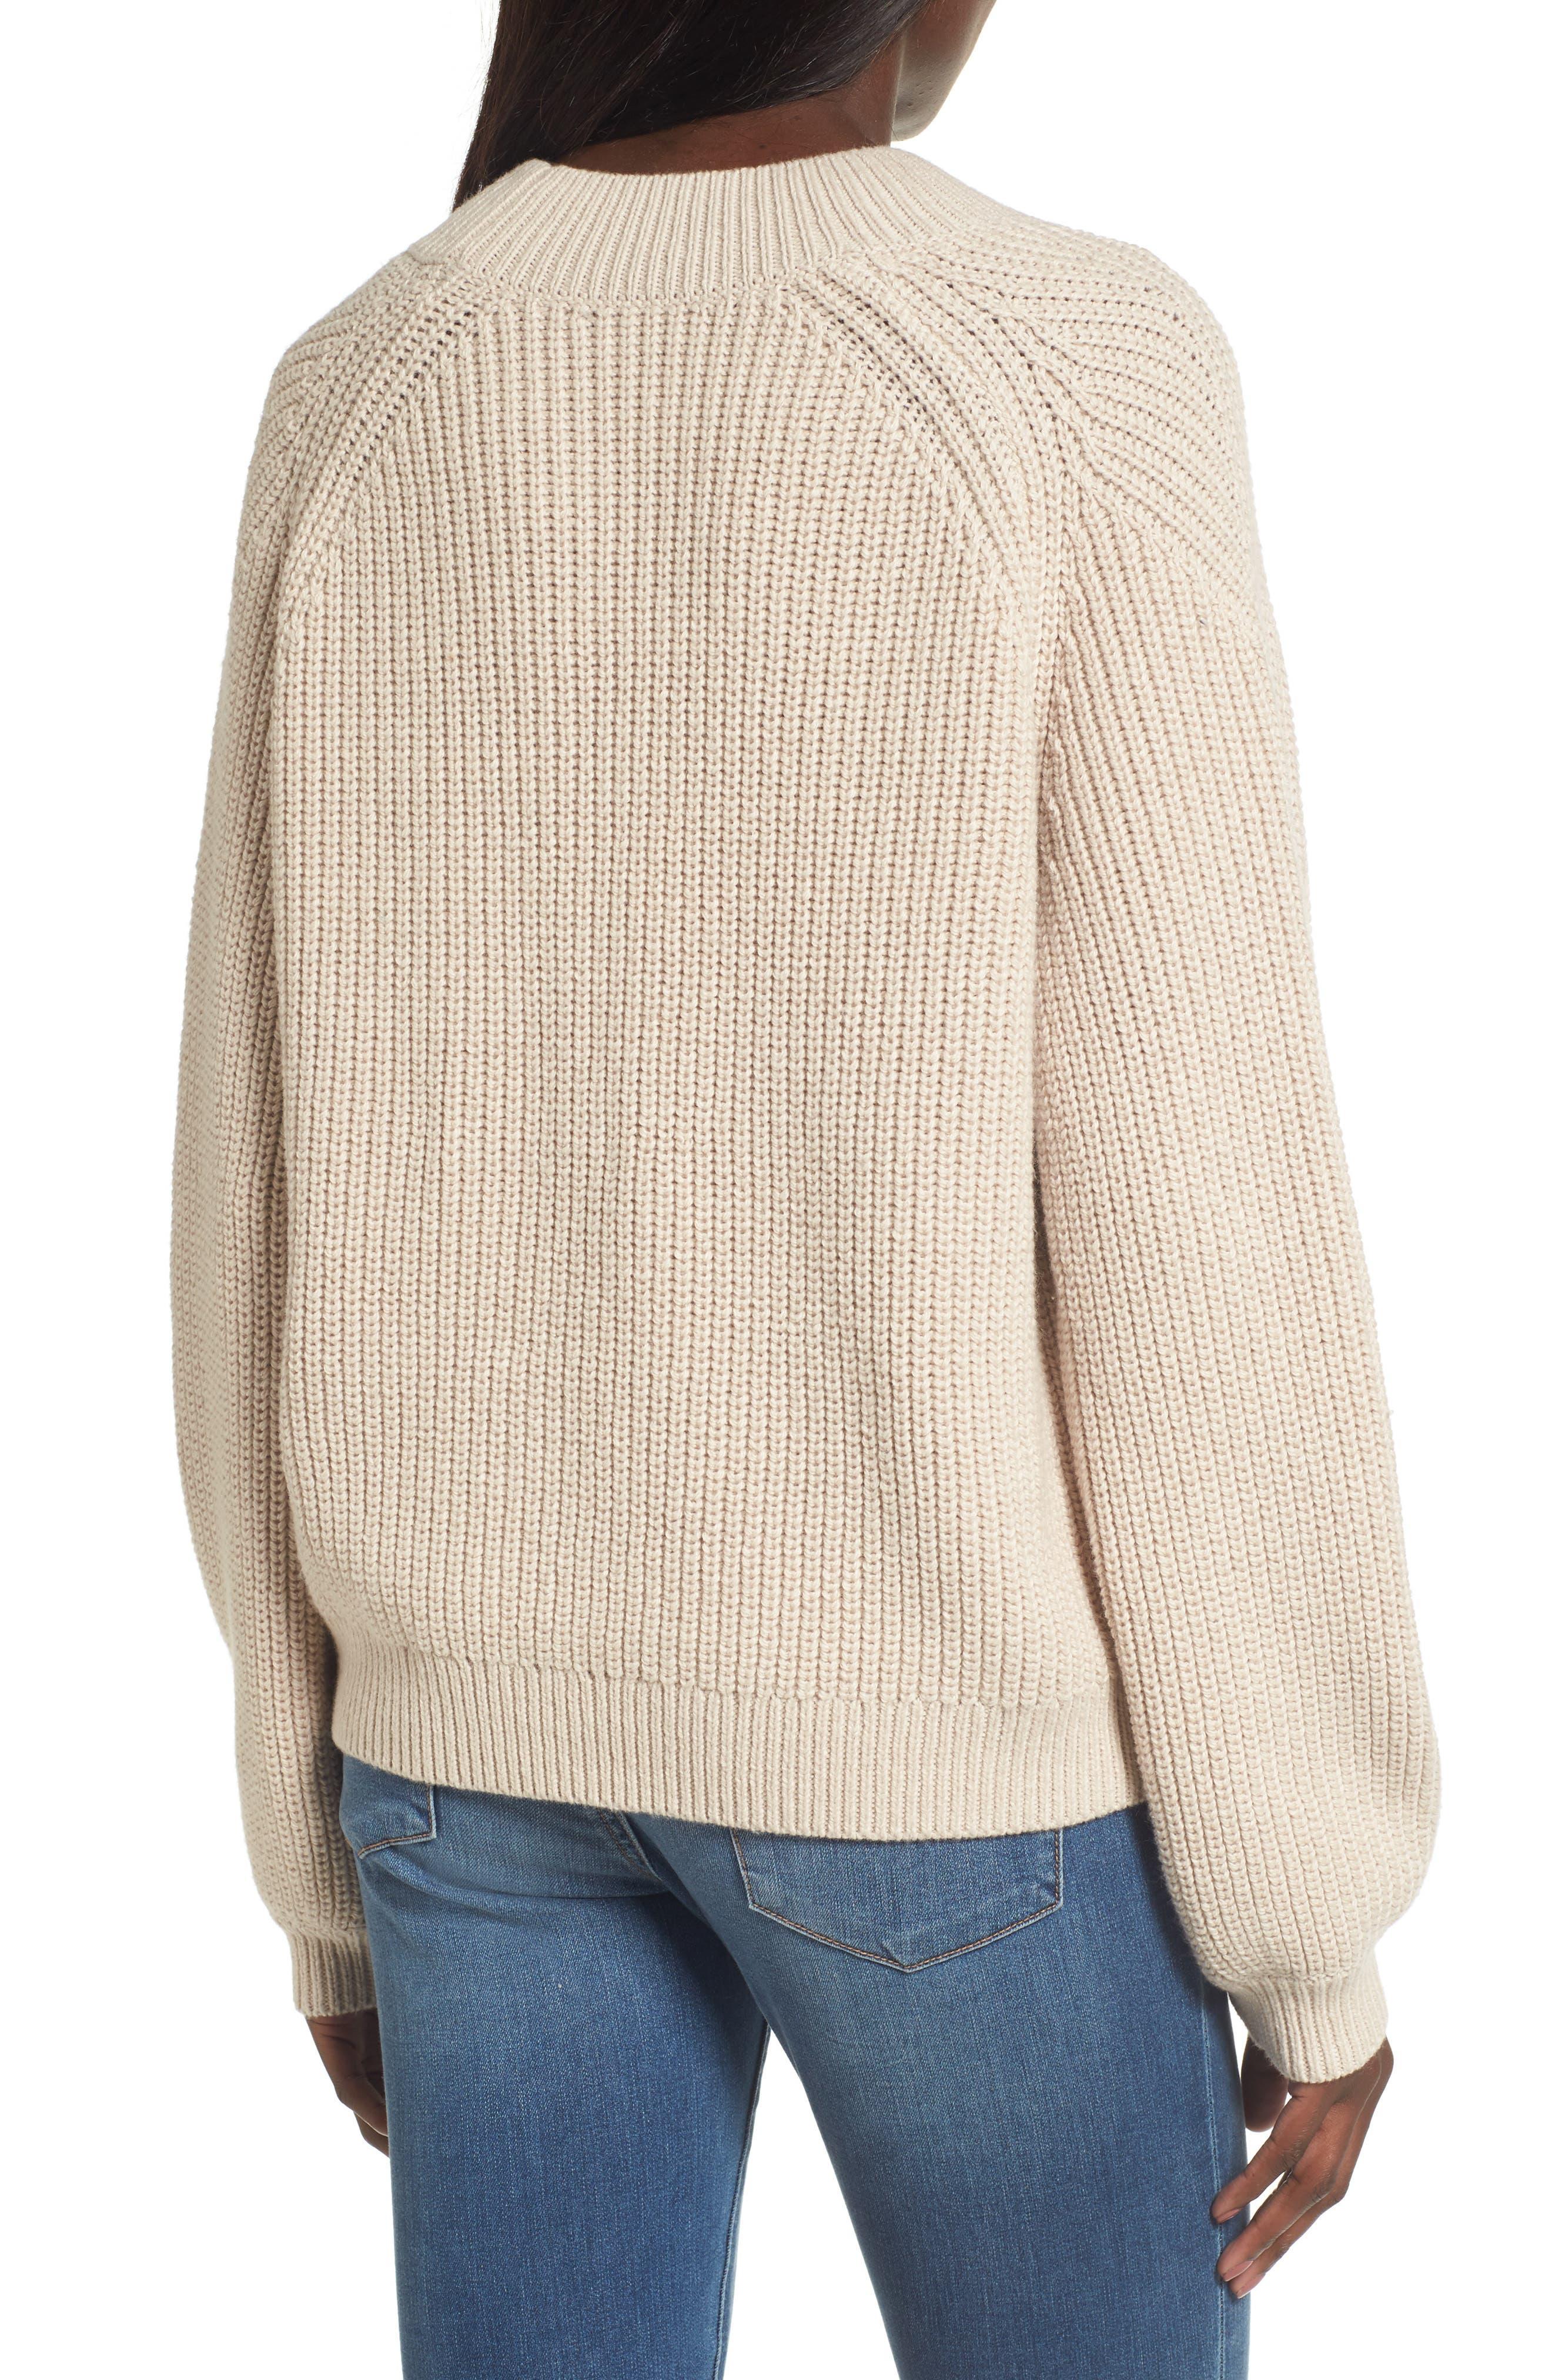 Shaker Stitch Sweater,                             Alternate thumbnail 2, color,                             270